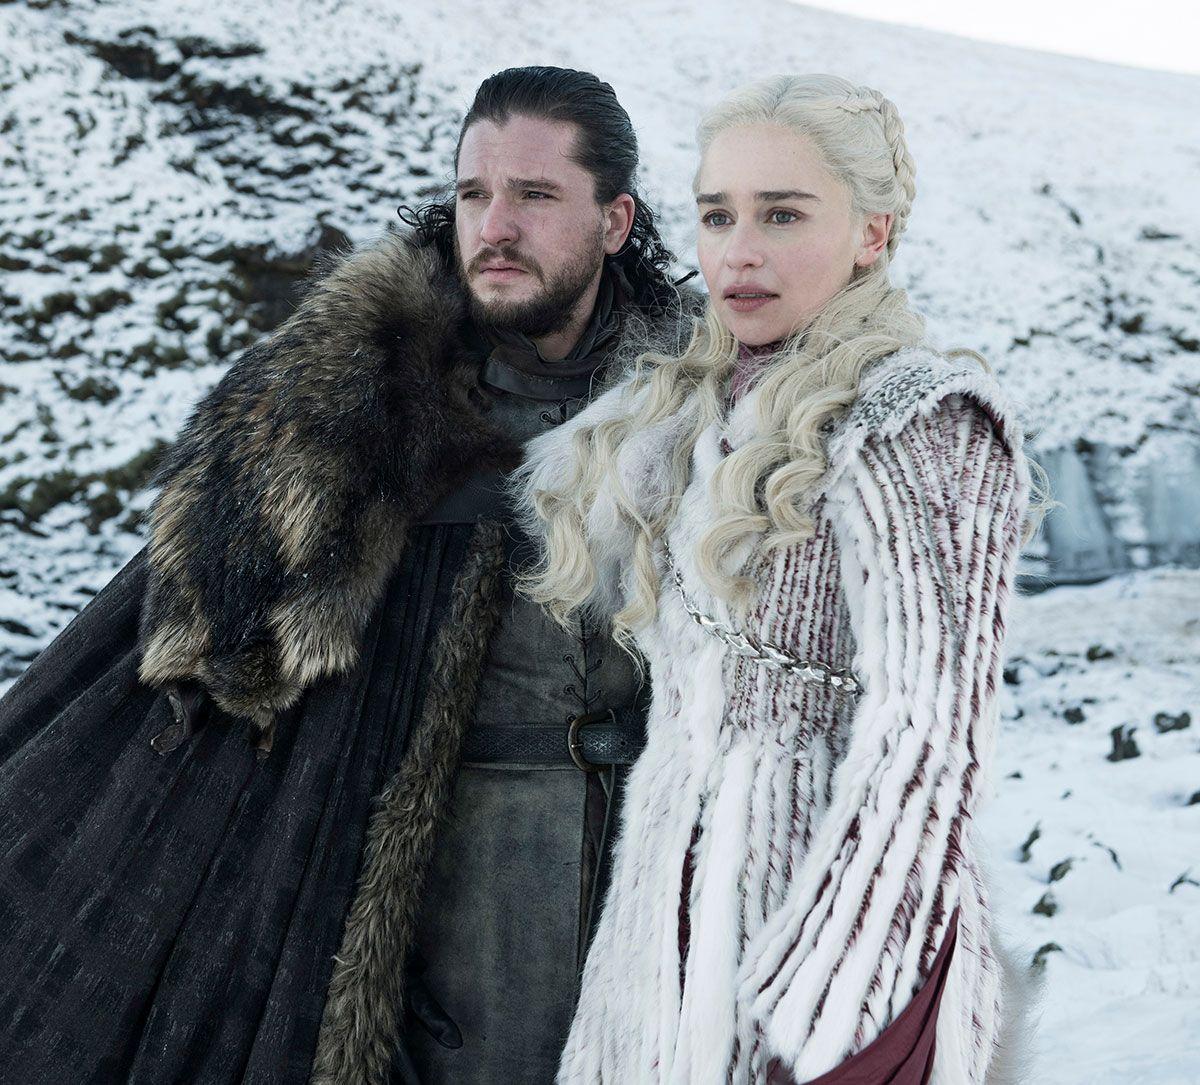 Jon Nieve y Daenerys Targaryen en 'Juego de Tronos'